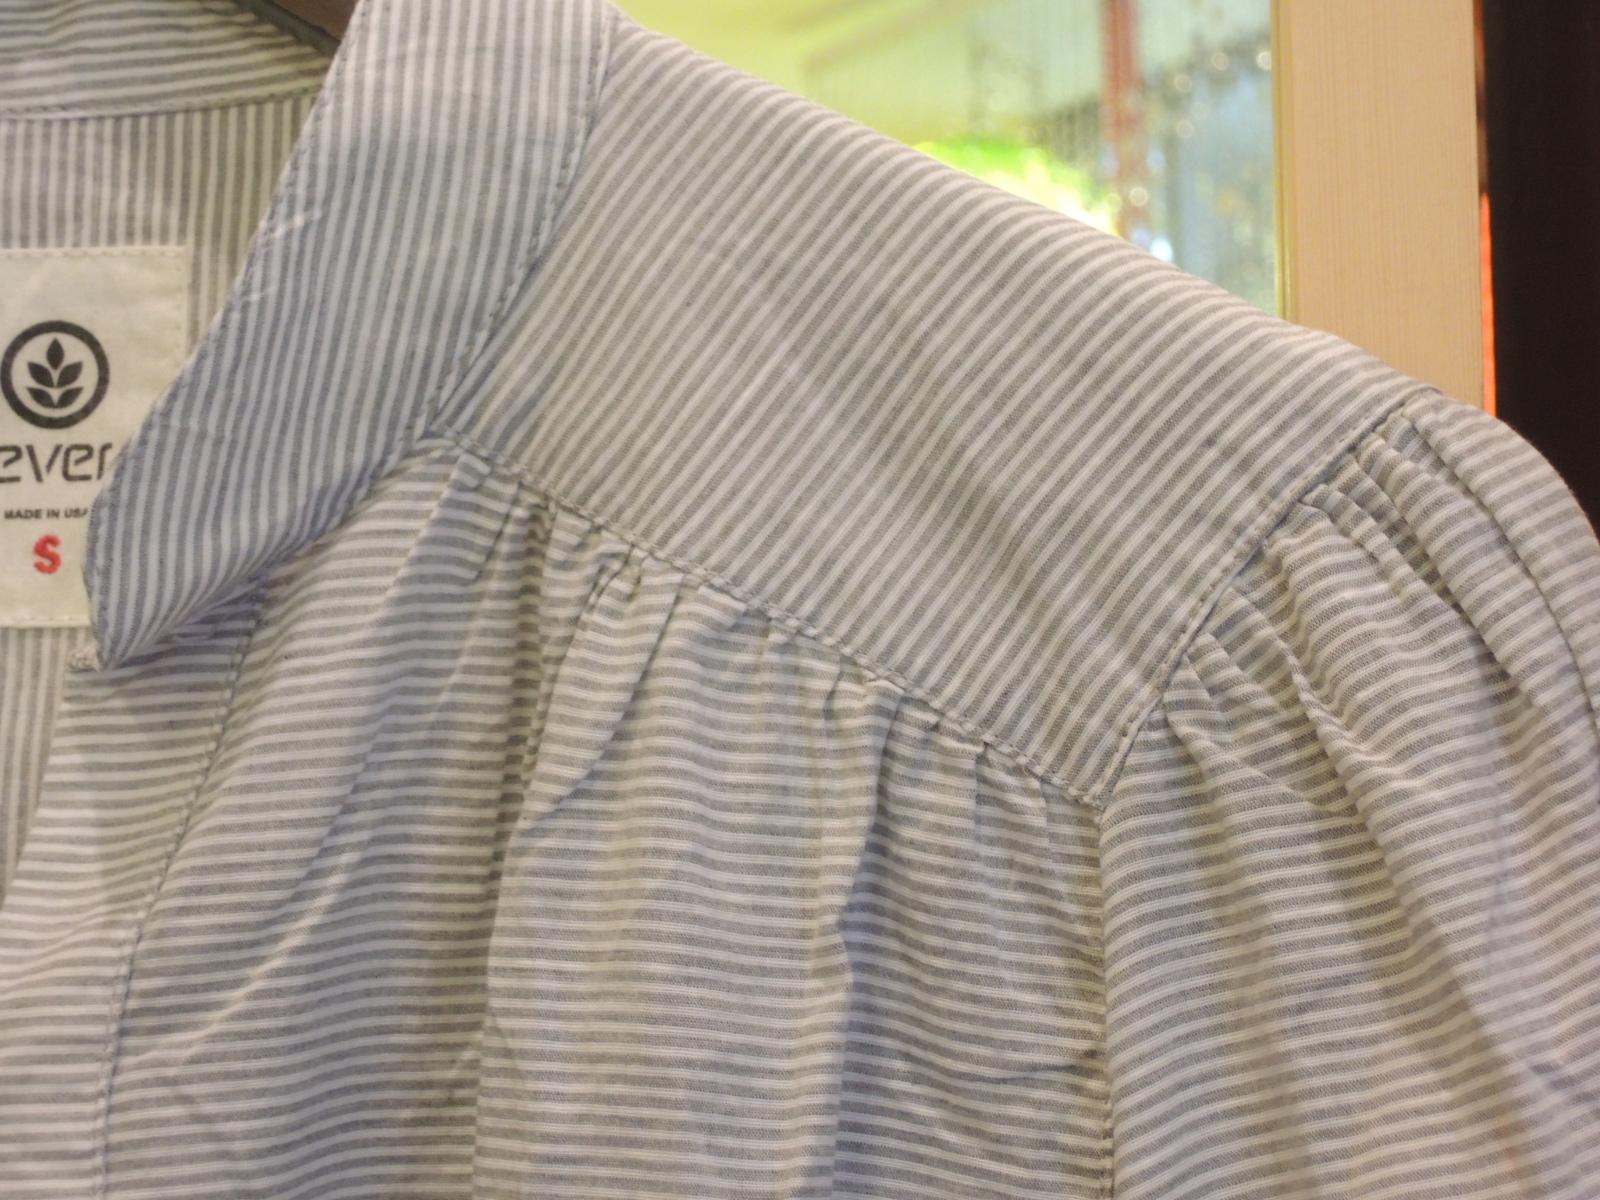 evershirts05.JPG